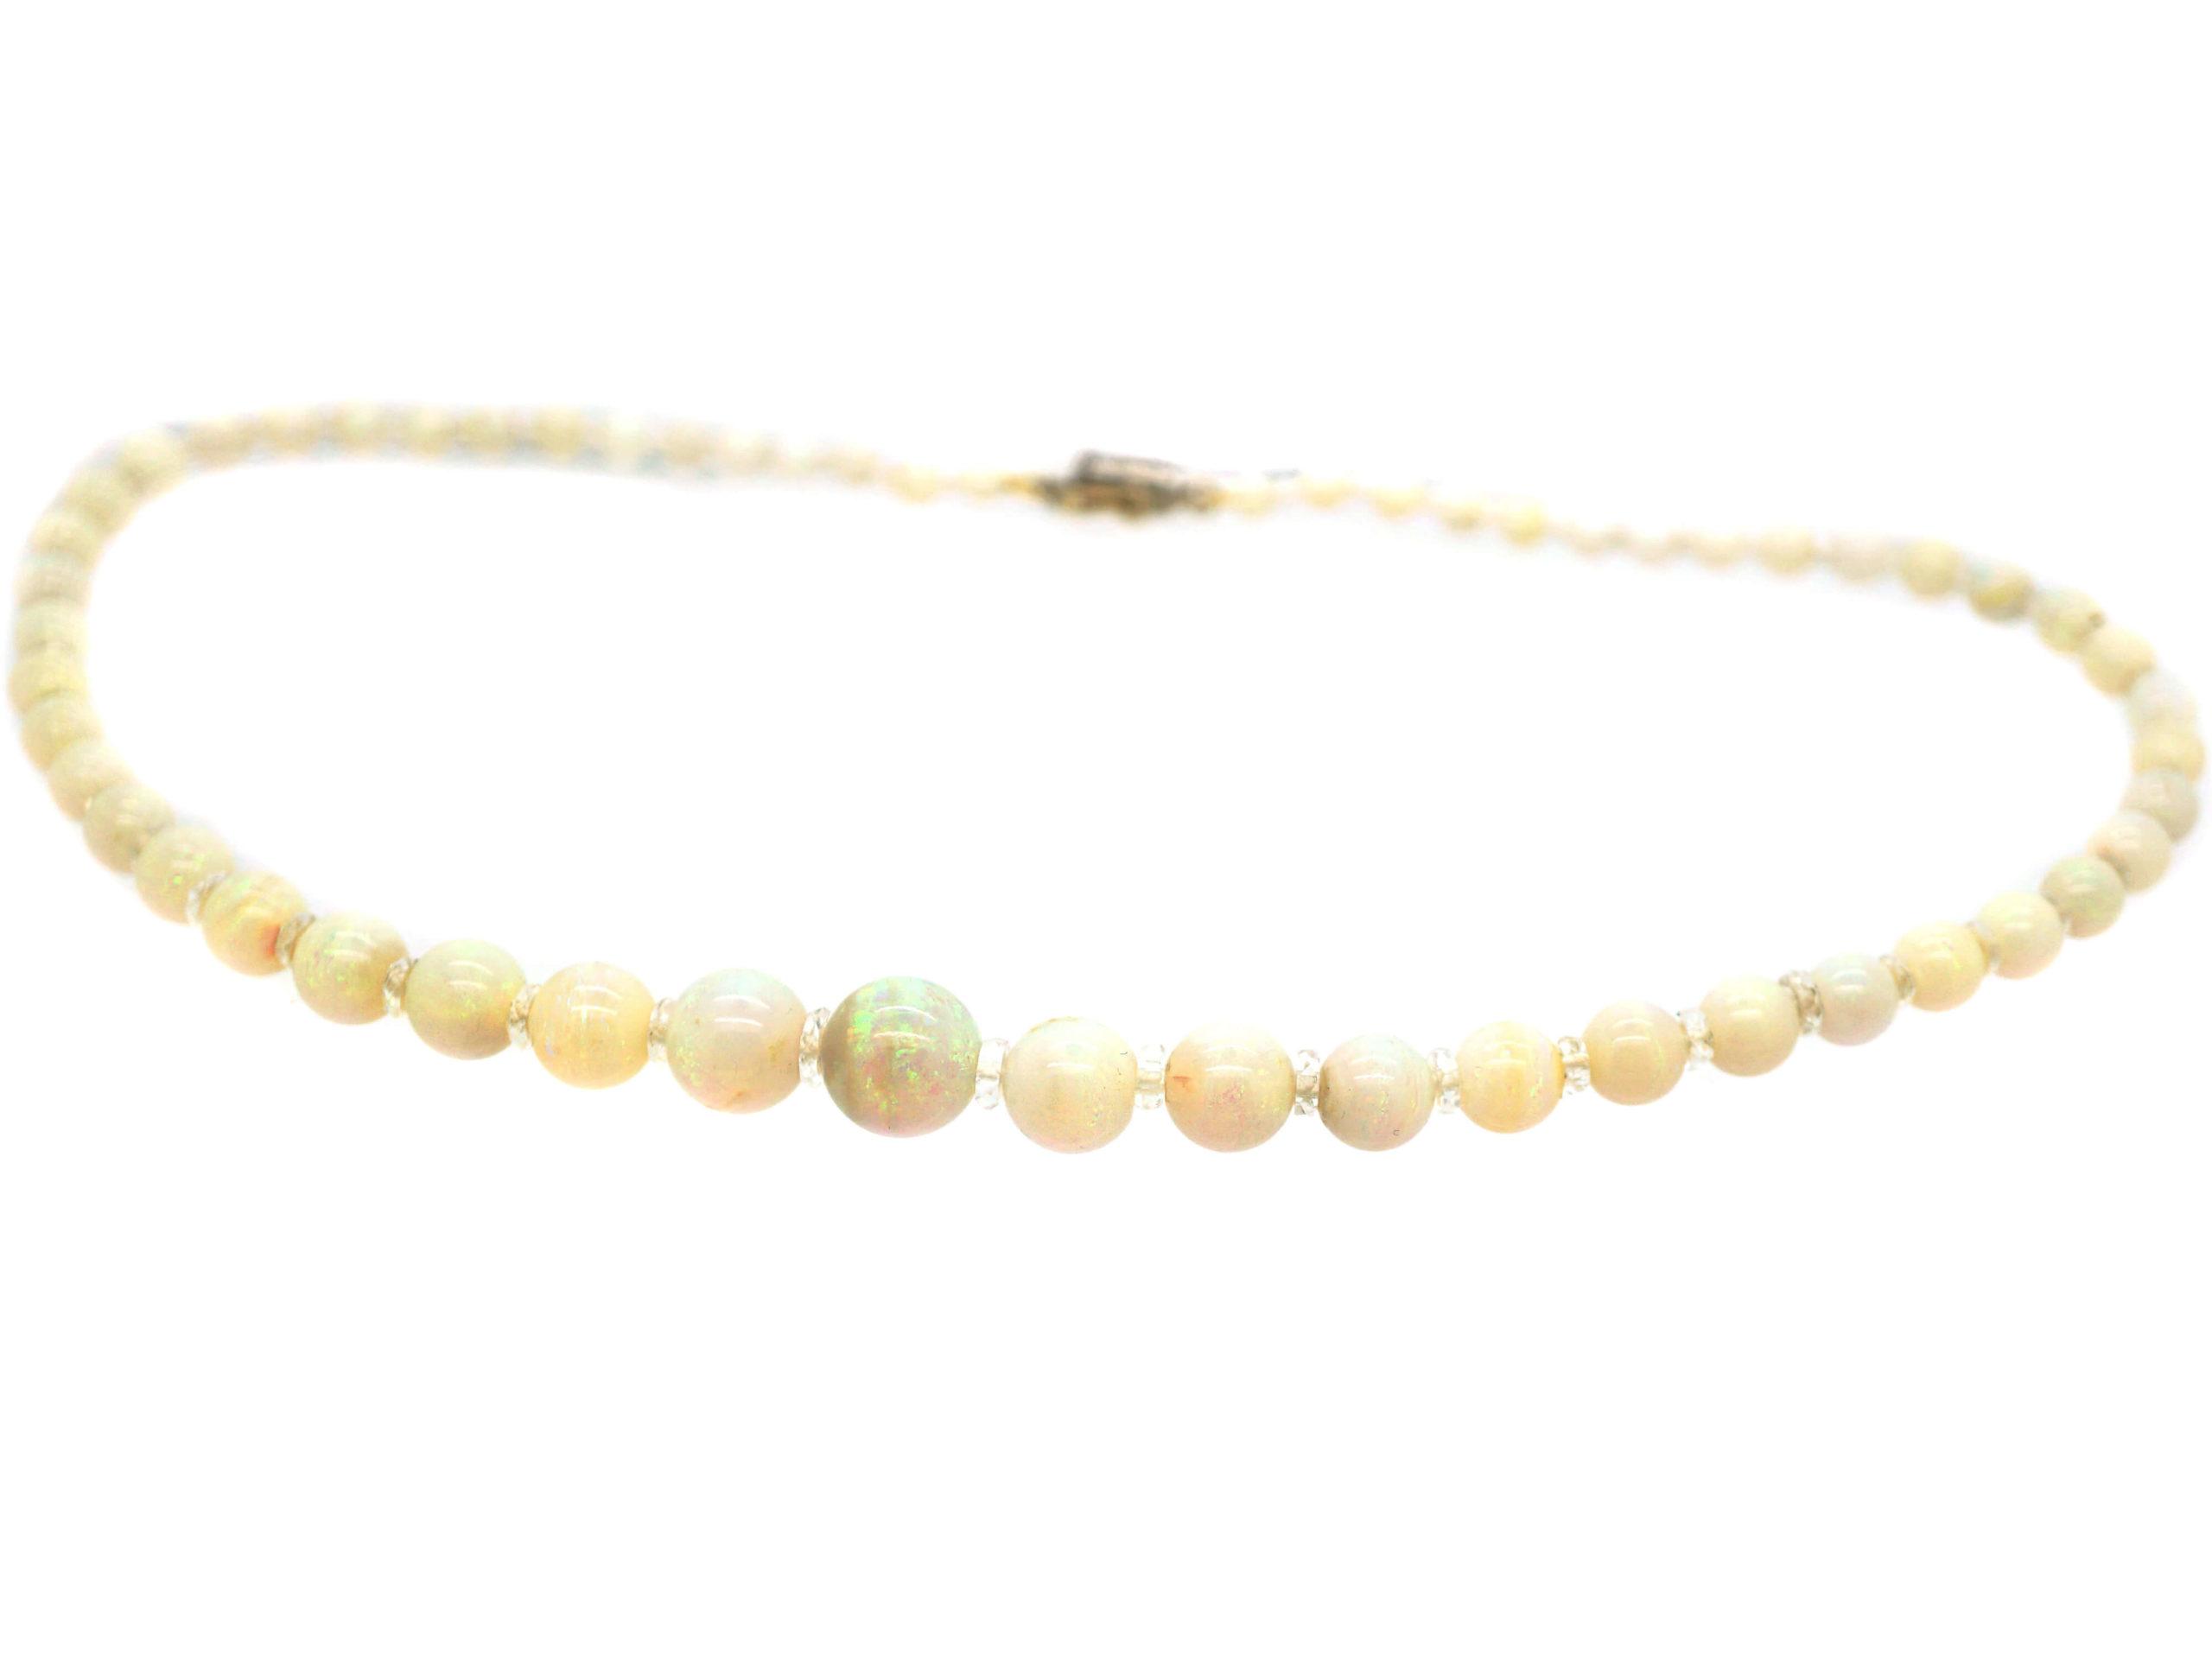 Edwardian Opal Beads with Diamond Set Clasp